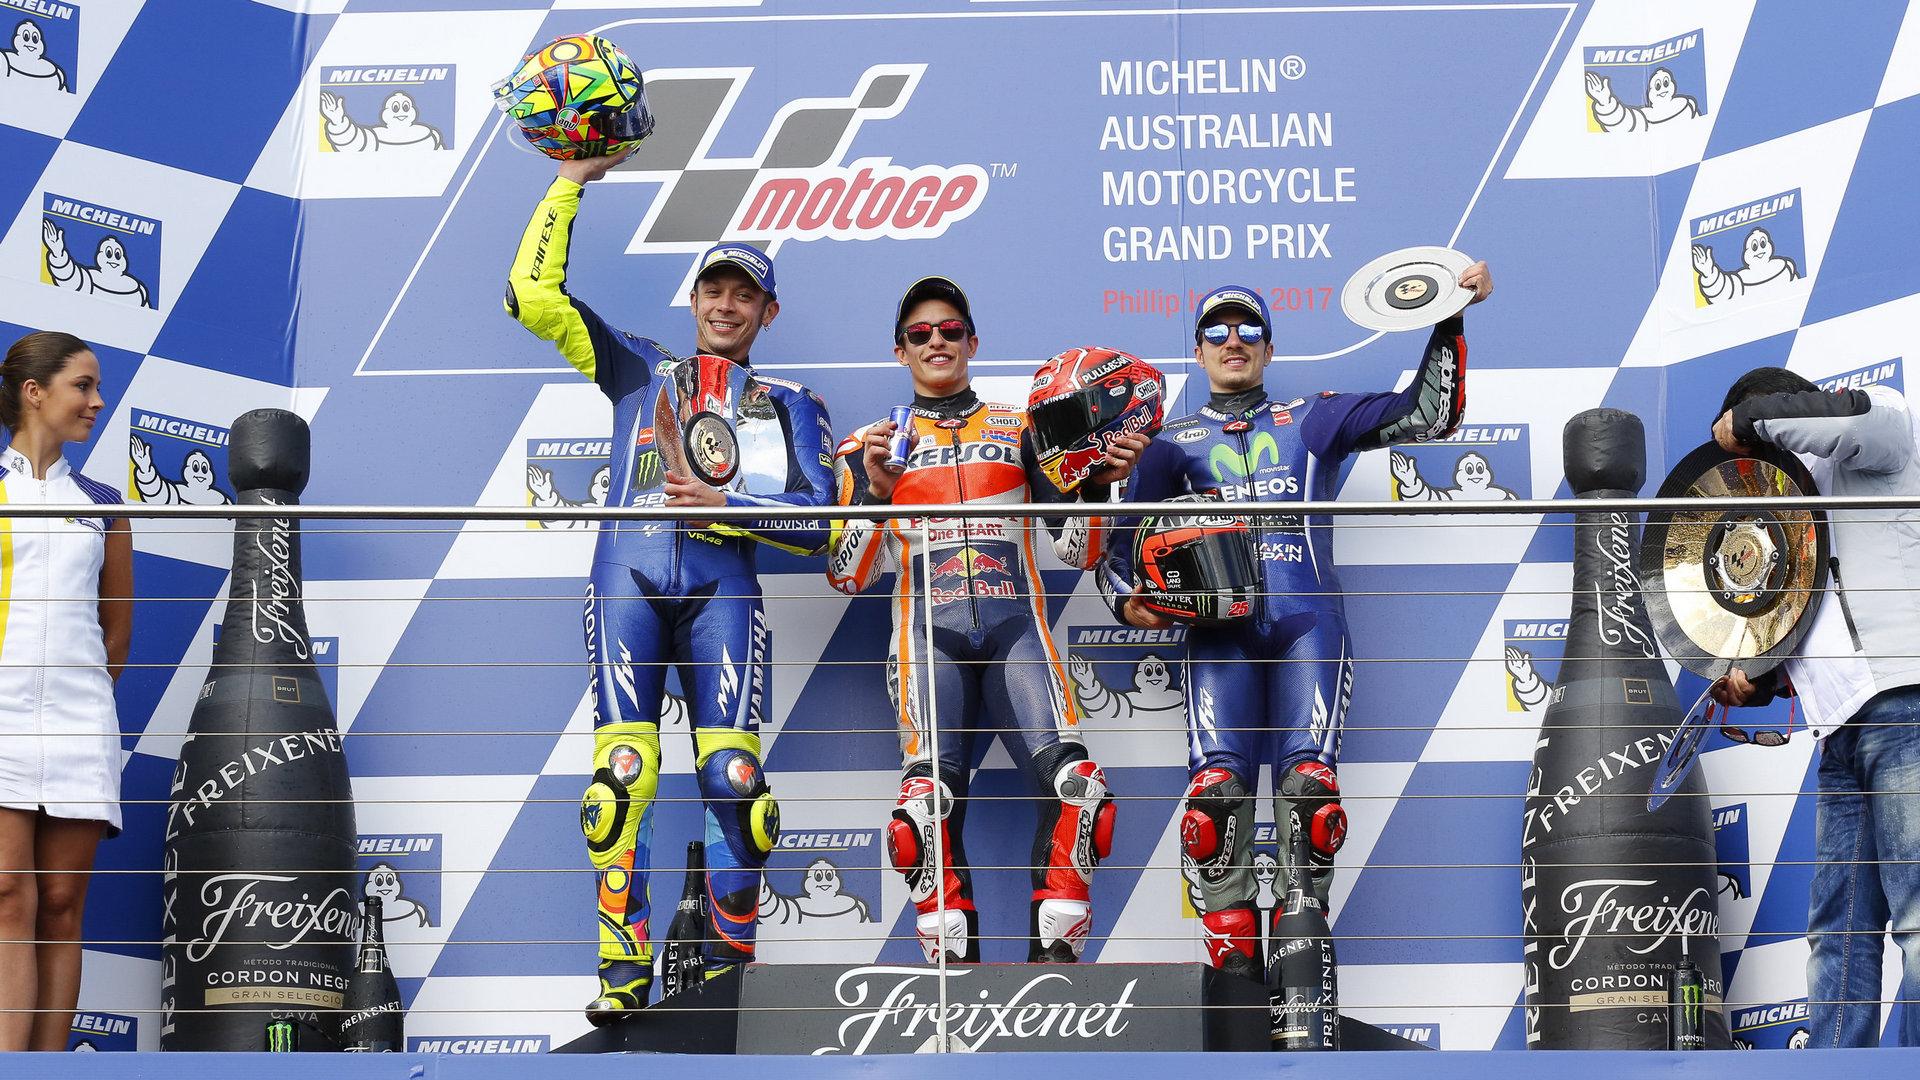 MotoGP: Marquez extends his lead in Phillip Island amidst exhilarating battle for the podium